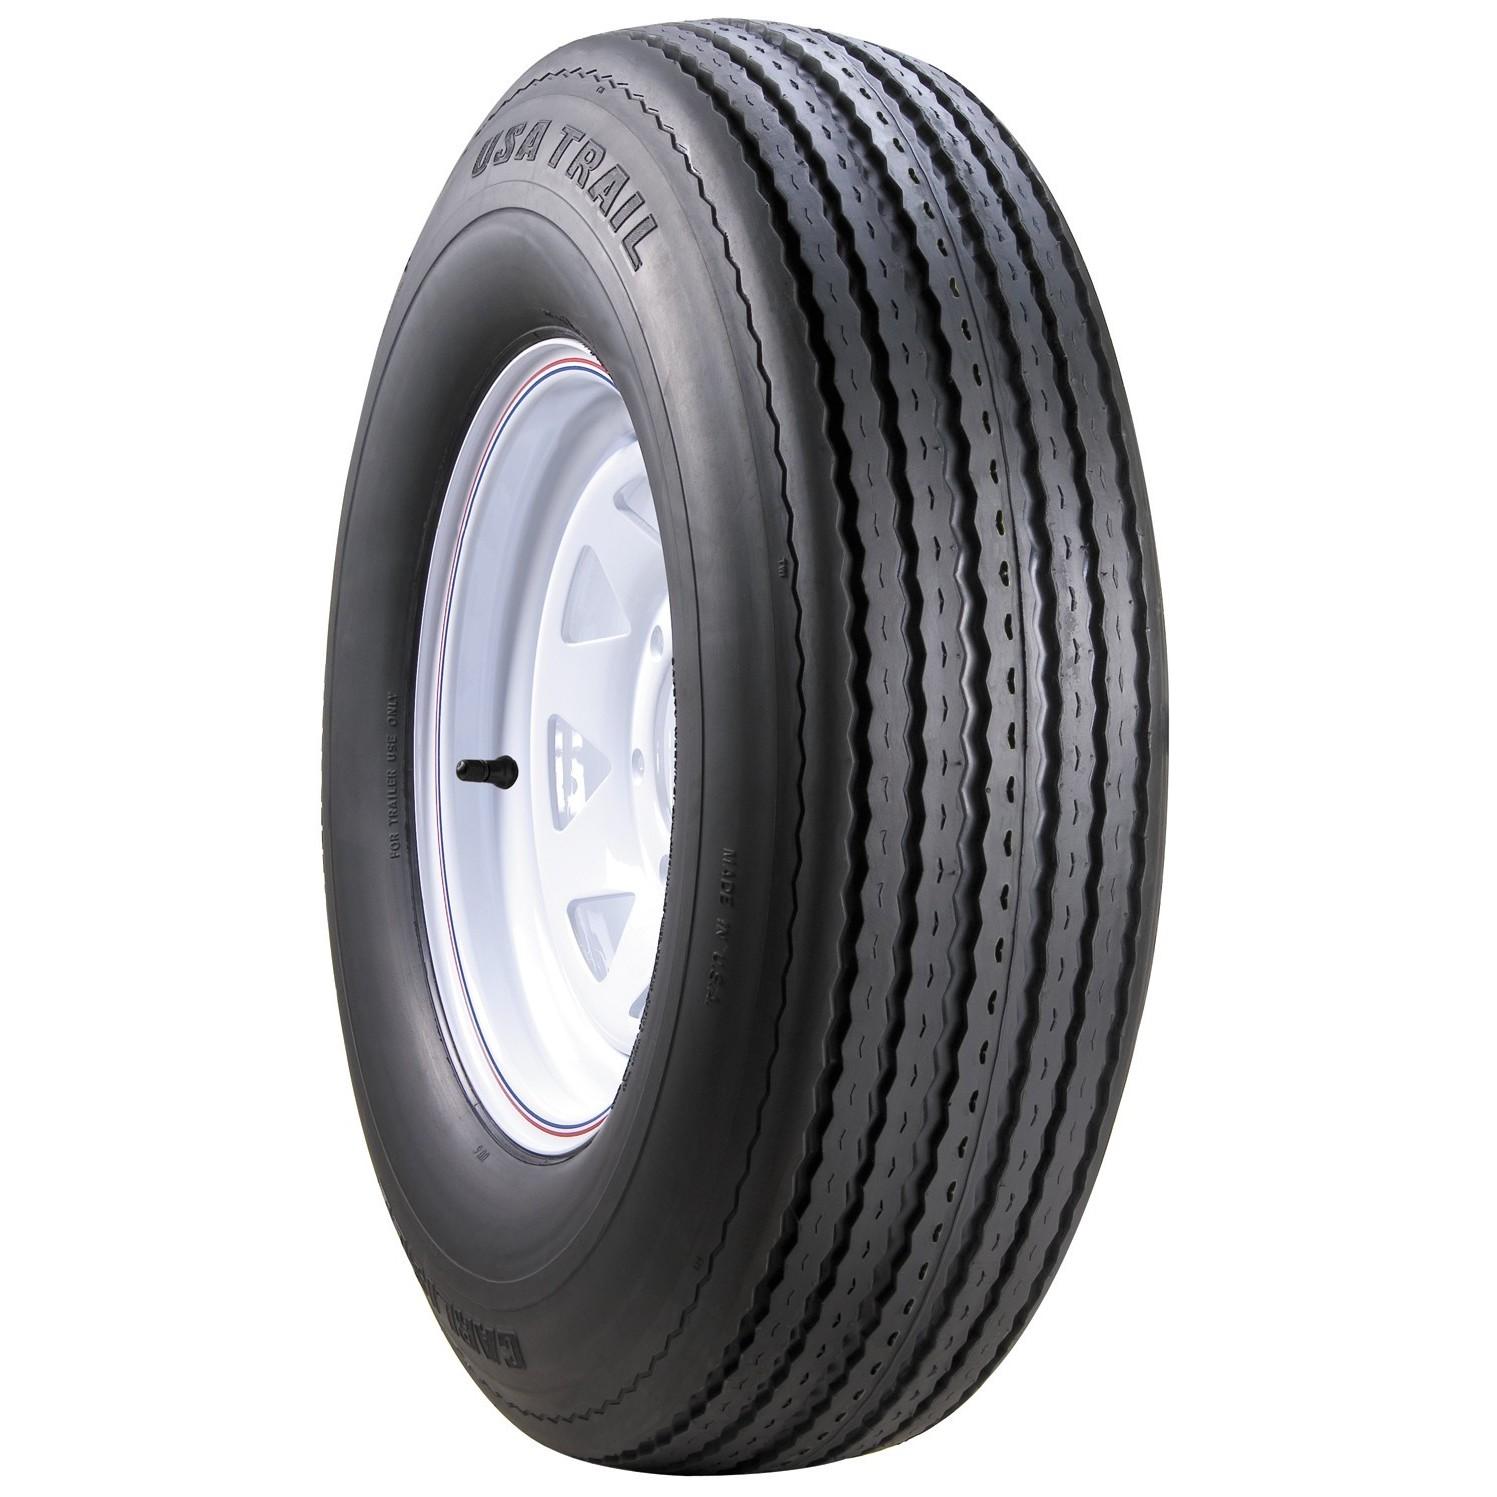 Carlisle USA Trail Bias Trailer Tire - 480-12 LRC/6 ply (...